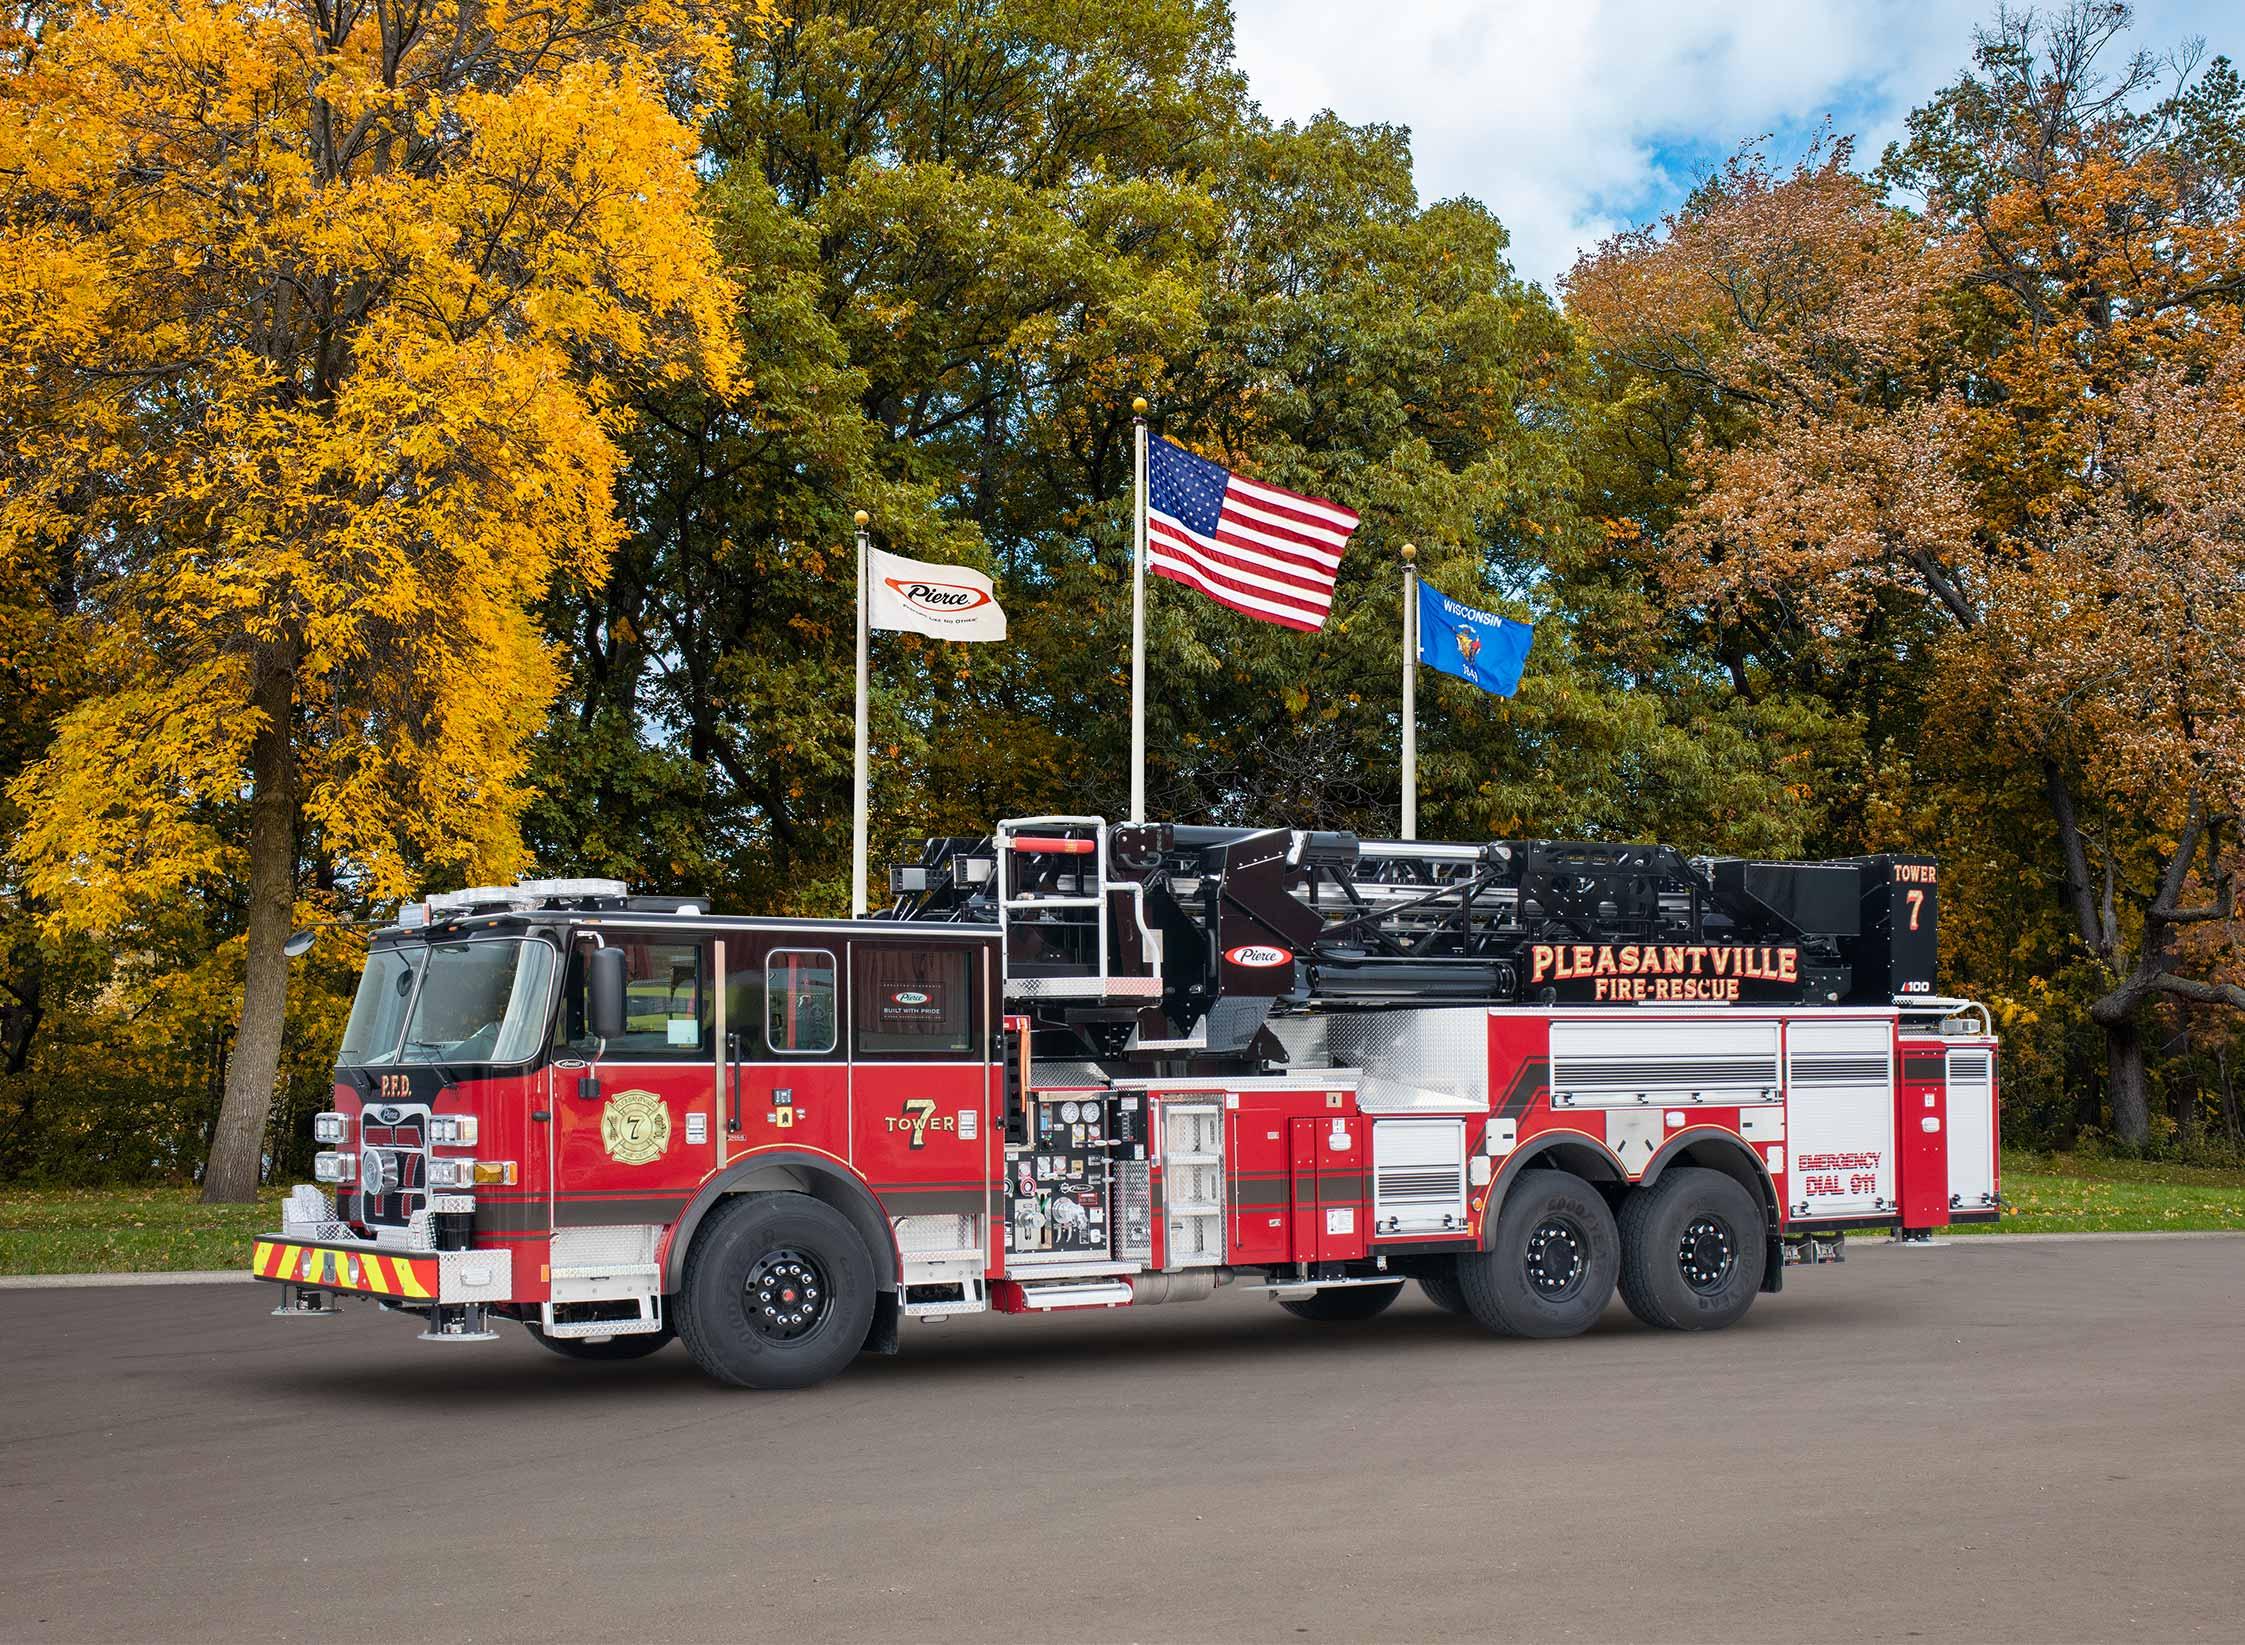 Pleasantville Fire Department - Aerial